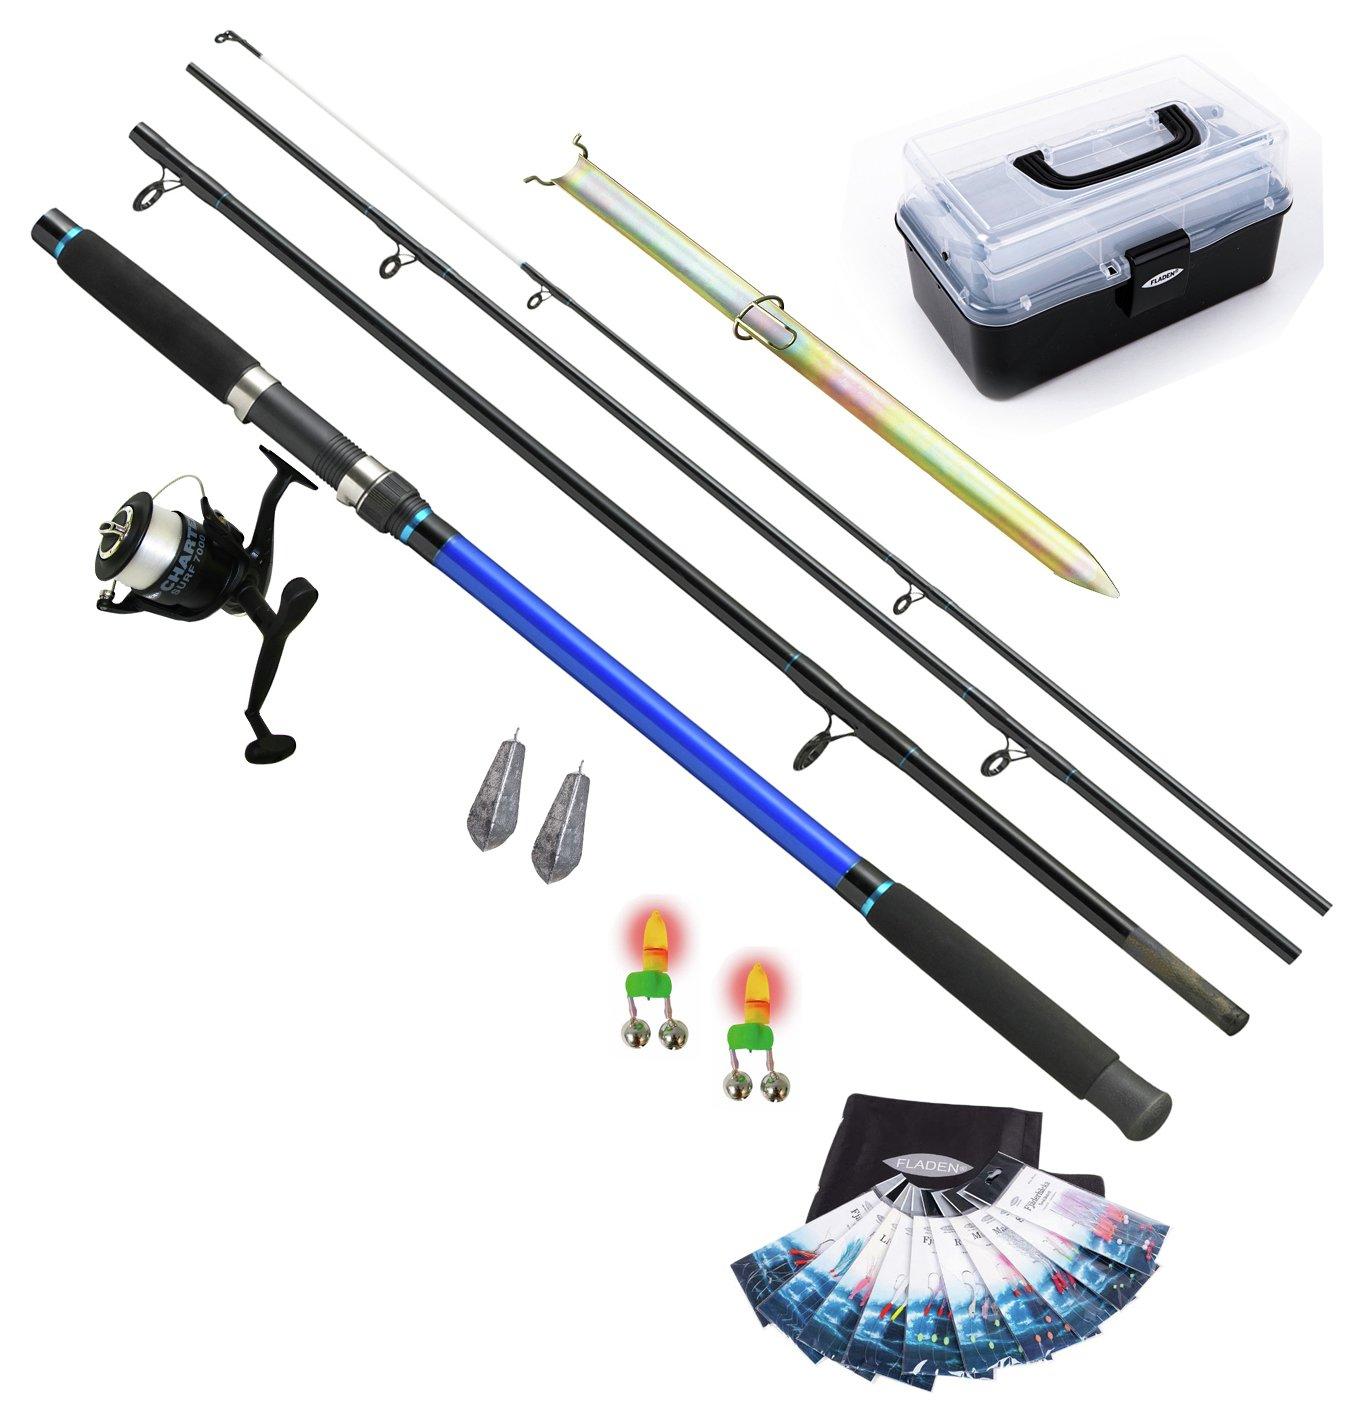 Fladen Beach/Shore Complete Rod, Reel & Accessories Set